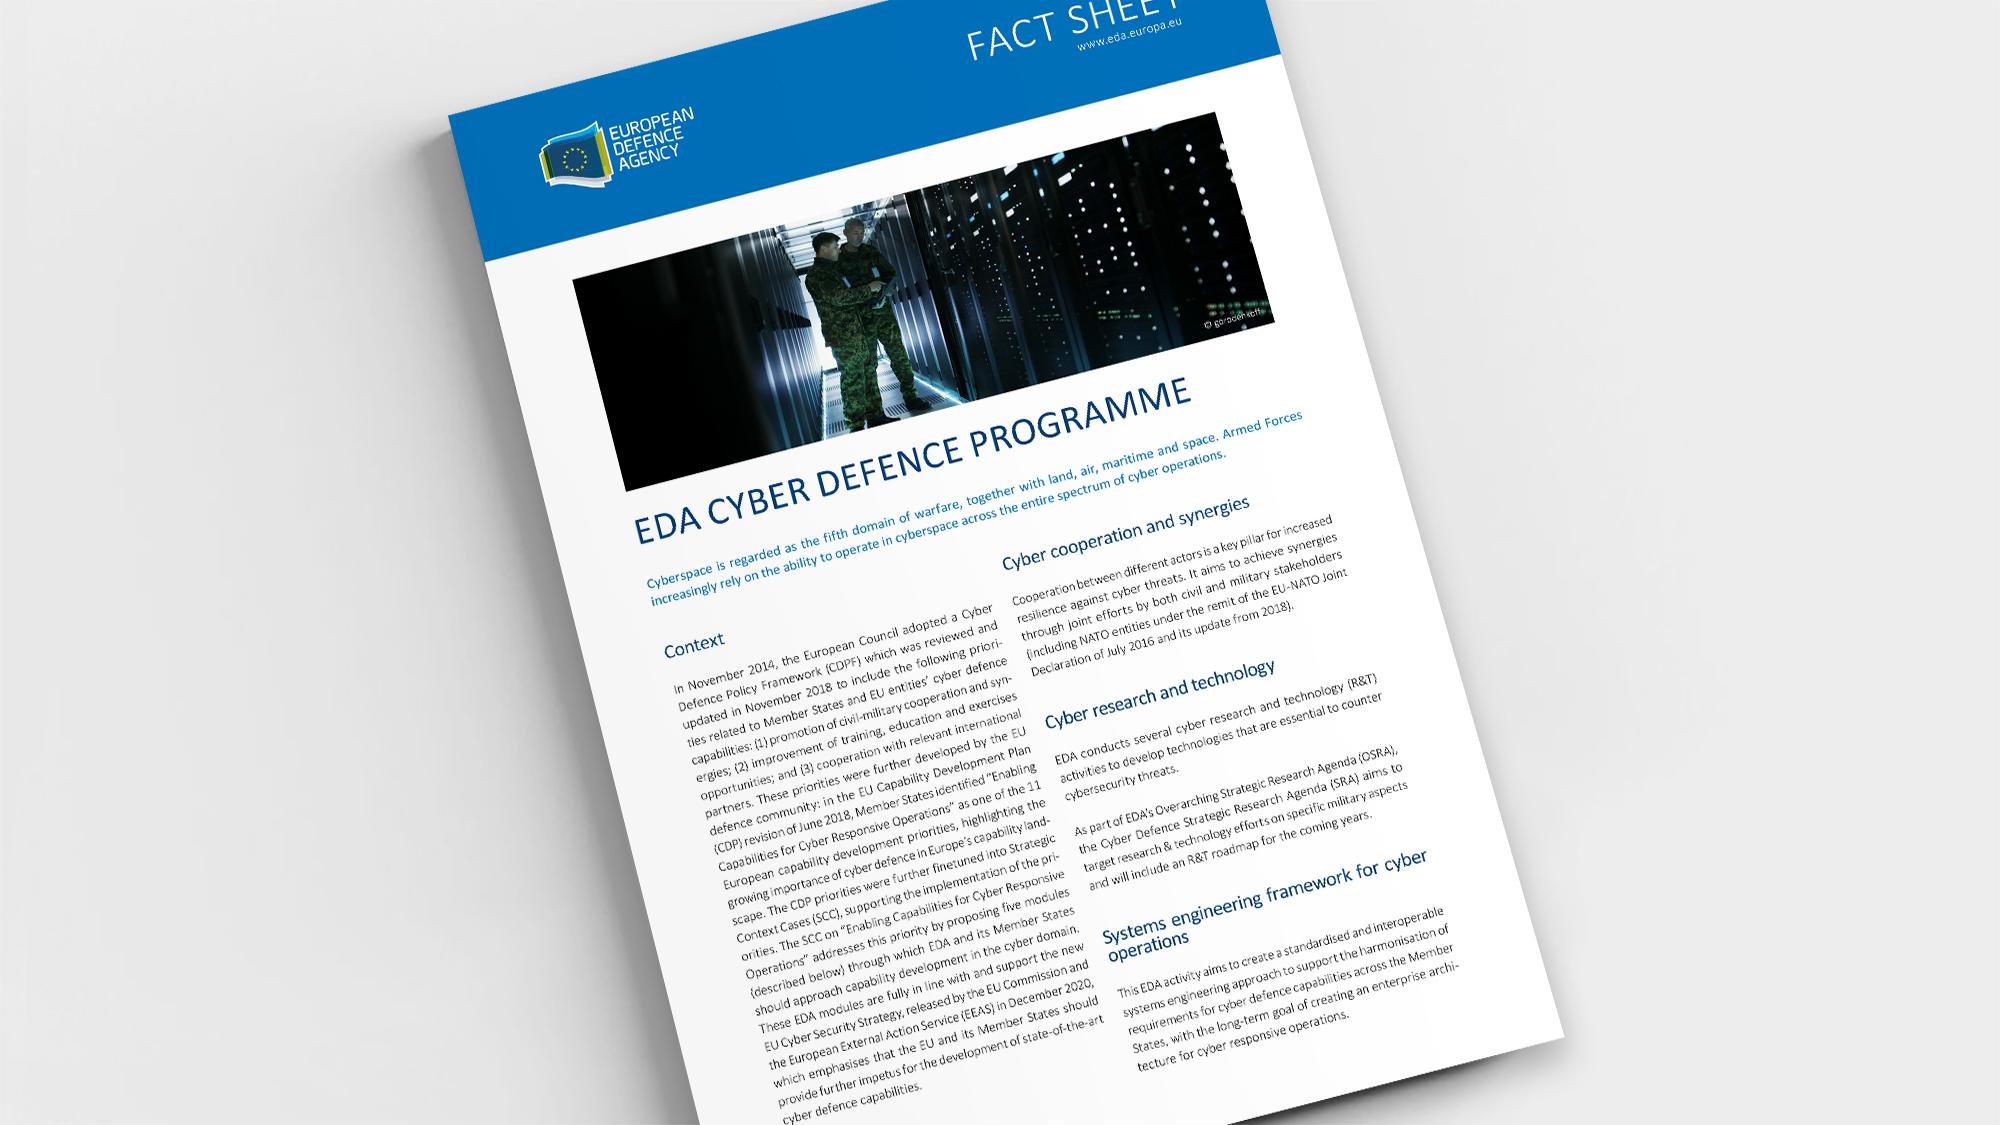 Factsheet-Cyber-Defence-Programme